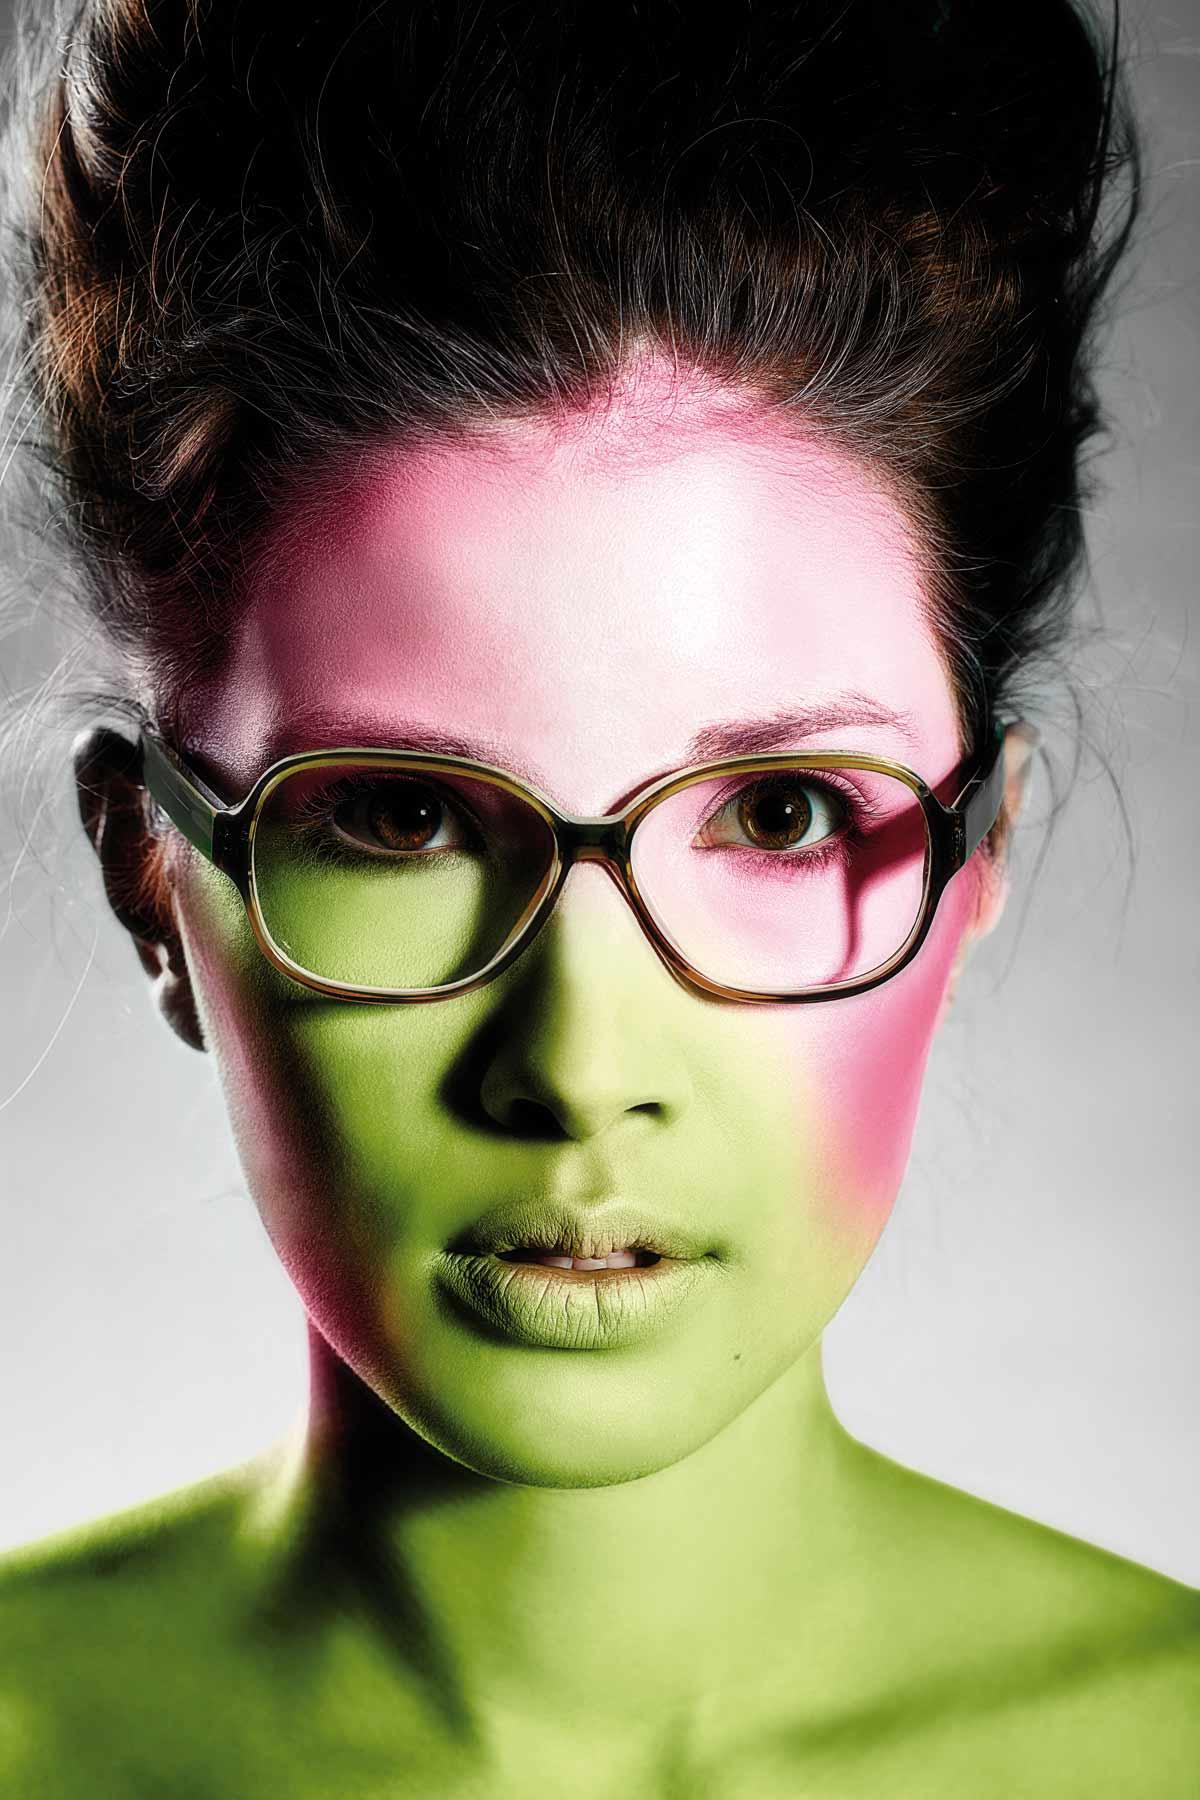 Eyewear Magazine 2_2011.03.13-people-eyewear-23659x